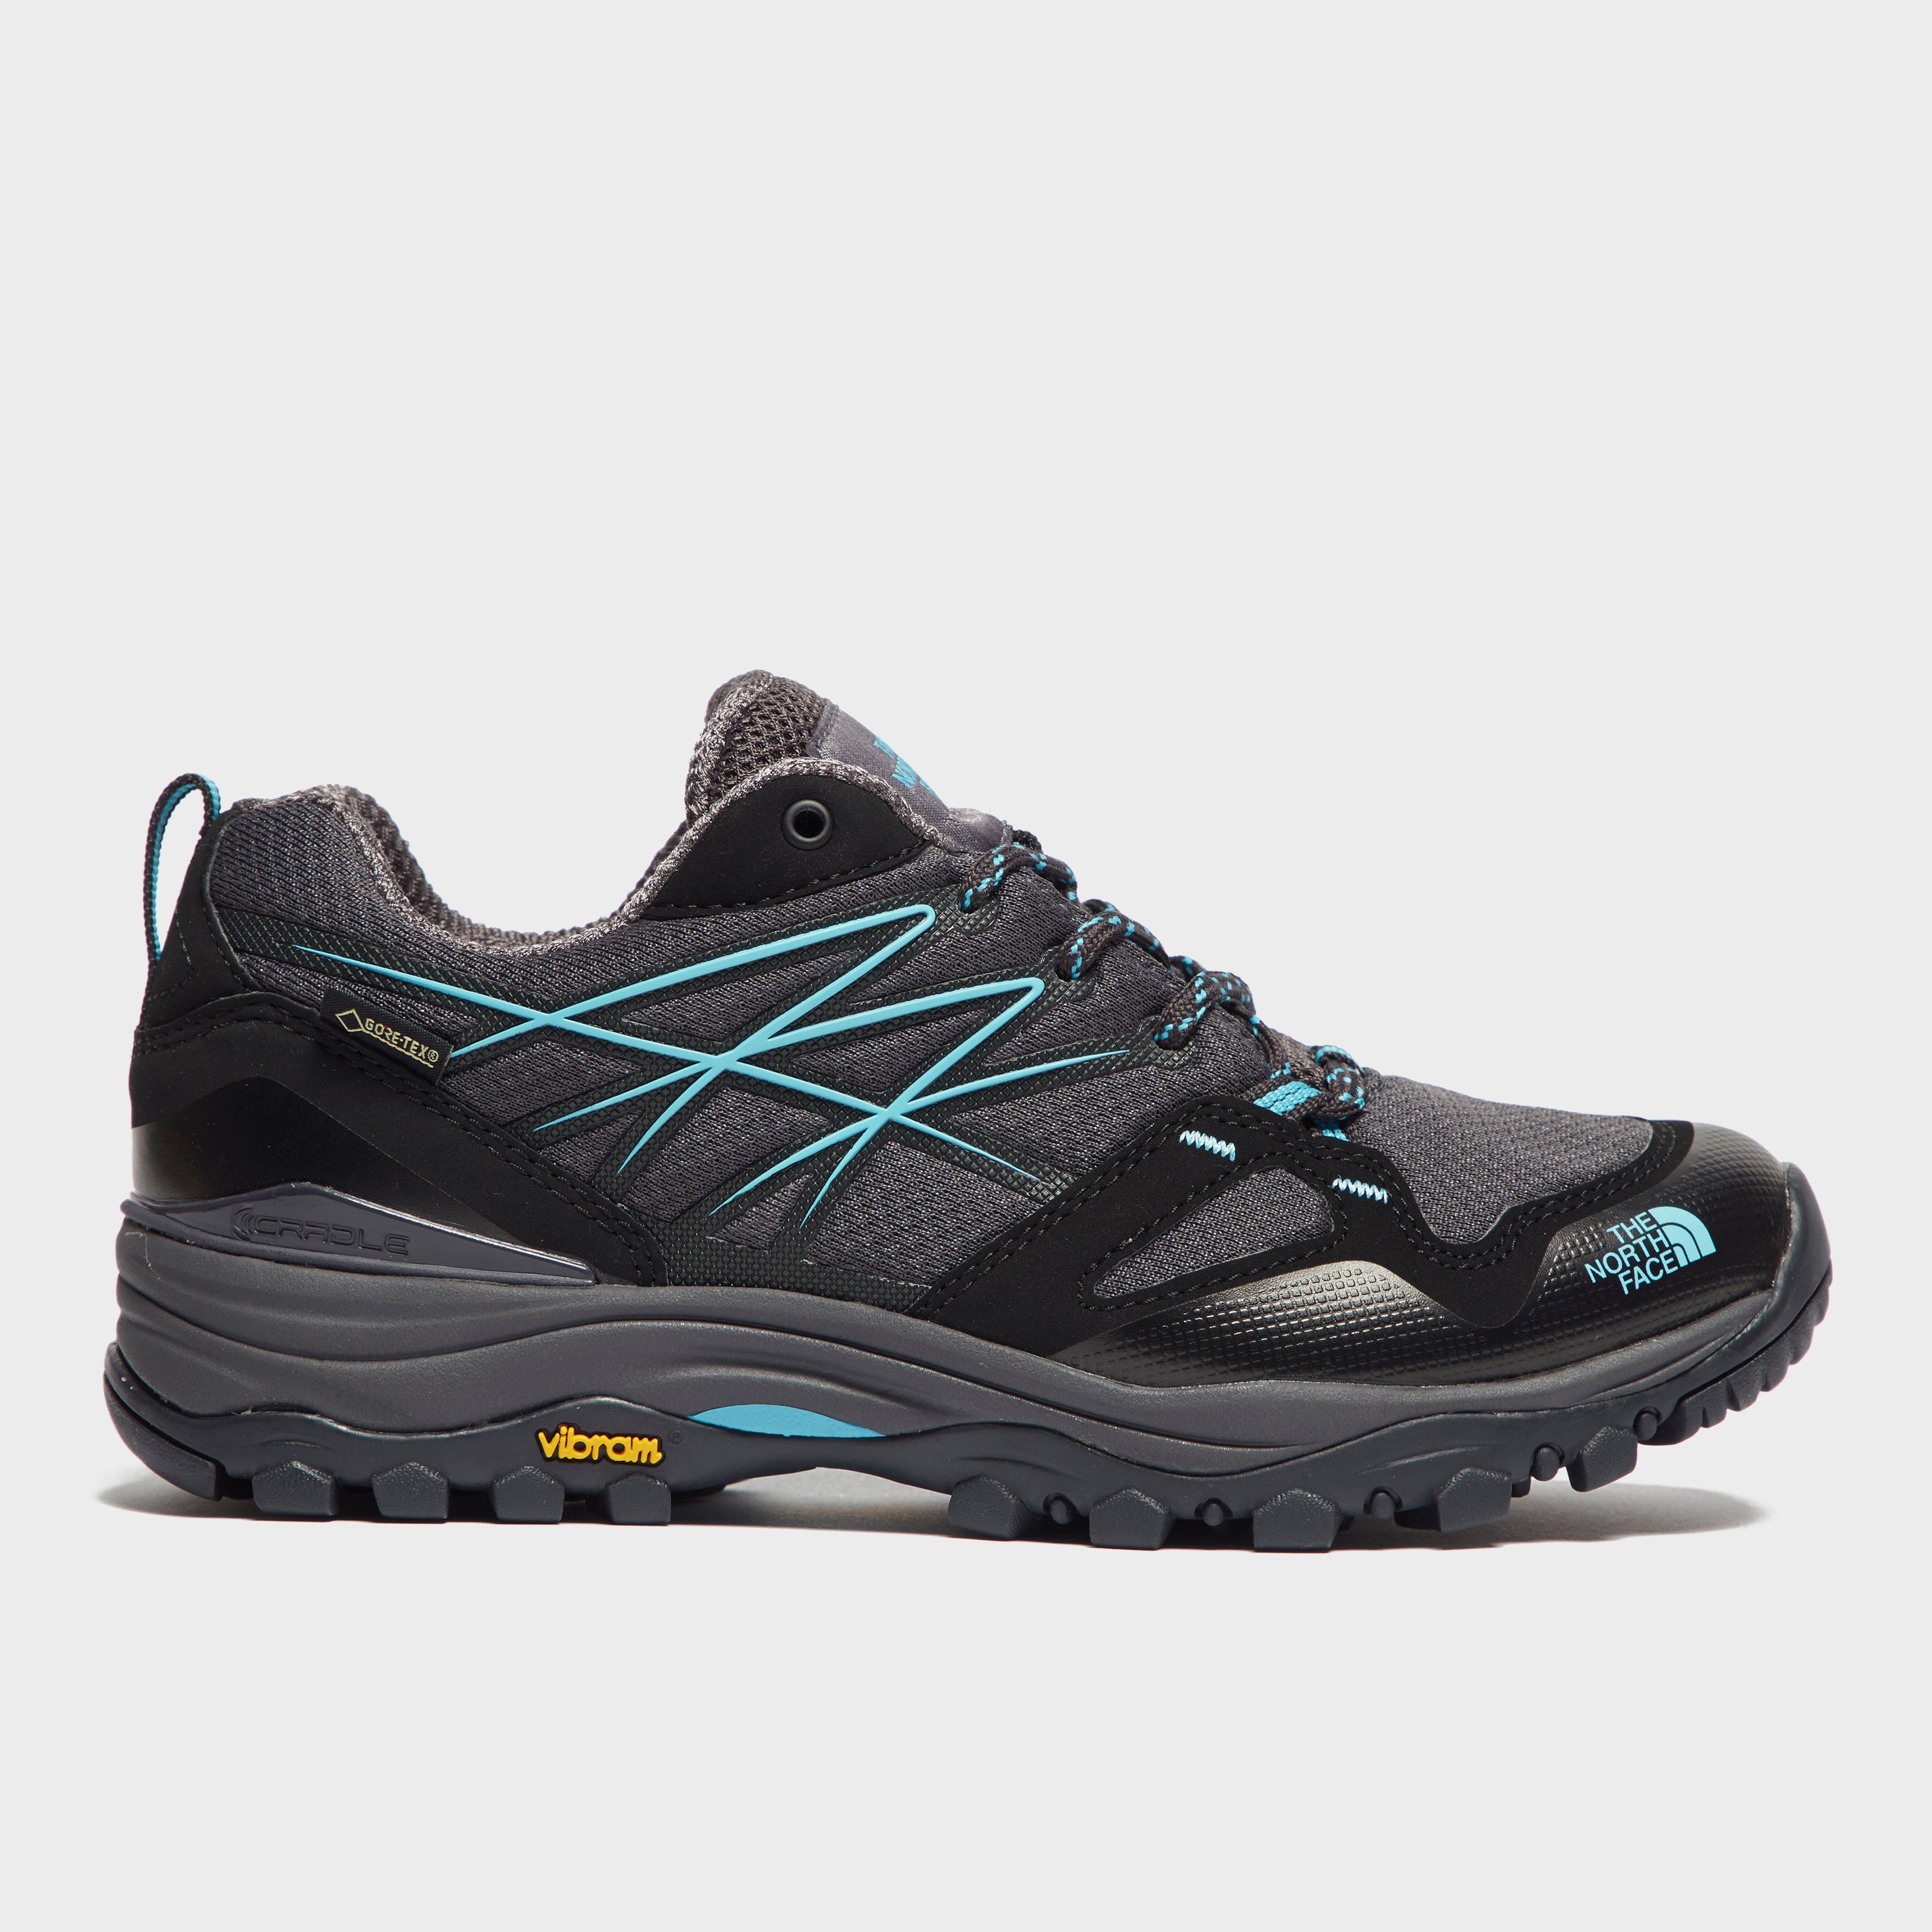 8ad55e15b Women's Hedgehog Fastpack GORE-TEX® Shoes